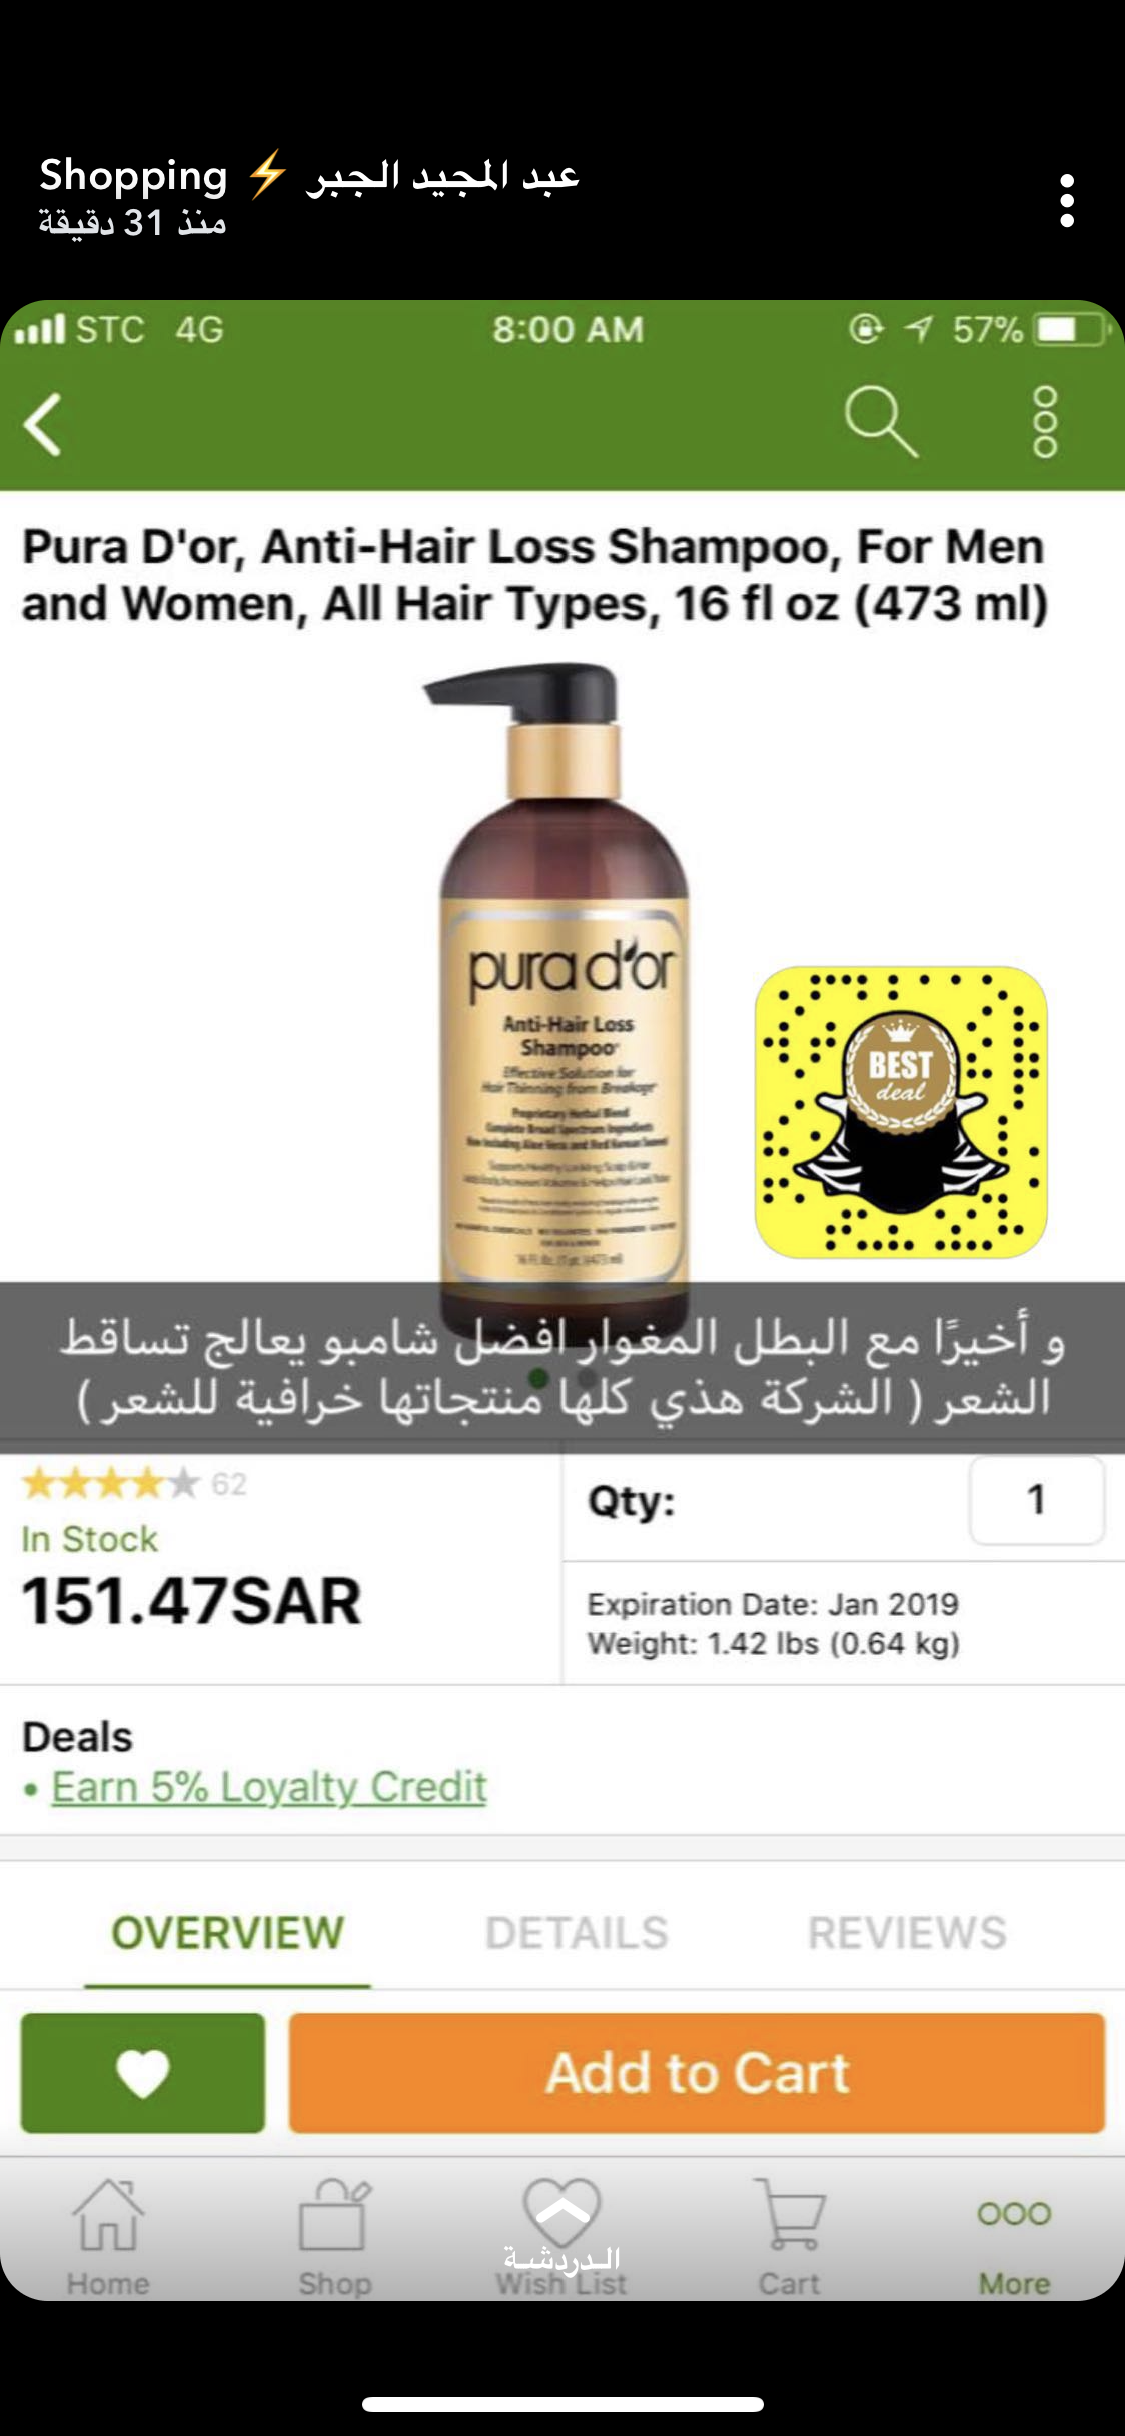 Pin By Estrella On مواقع Anti Hair Loss Shampoo Makeup Skin Care Beauty Skin Care Routine